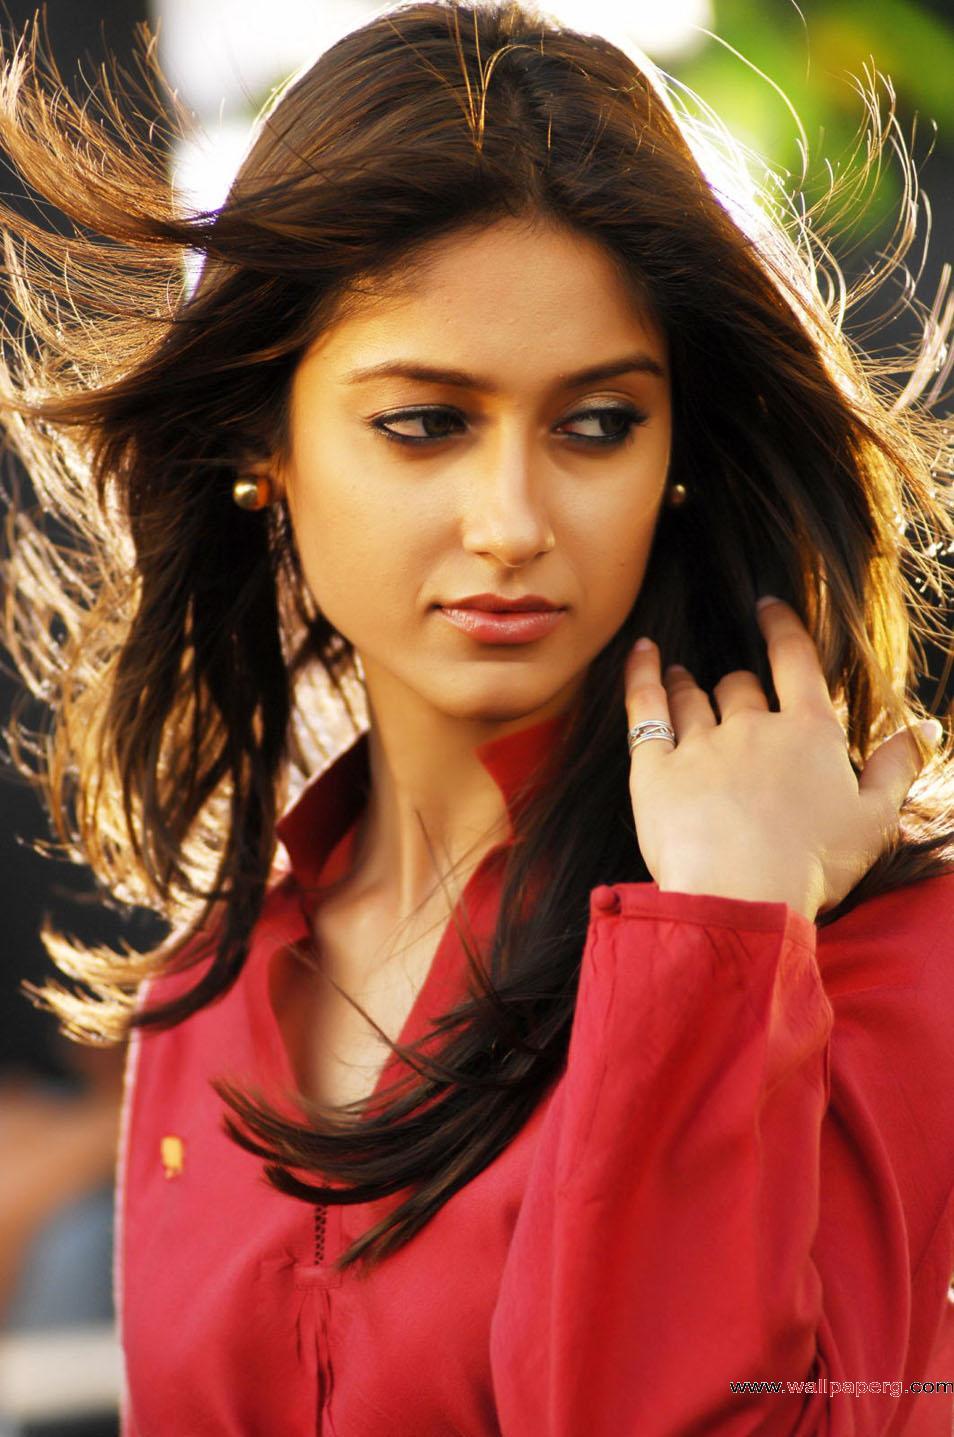 Bollywood Actress Hd Wallpapers Main Tera Hero Heroine Name 218205 Hd Wallpaper Backgrounds Download